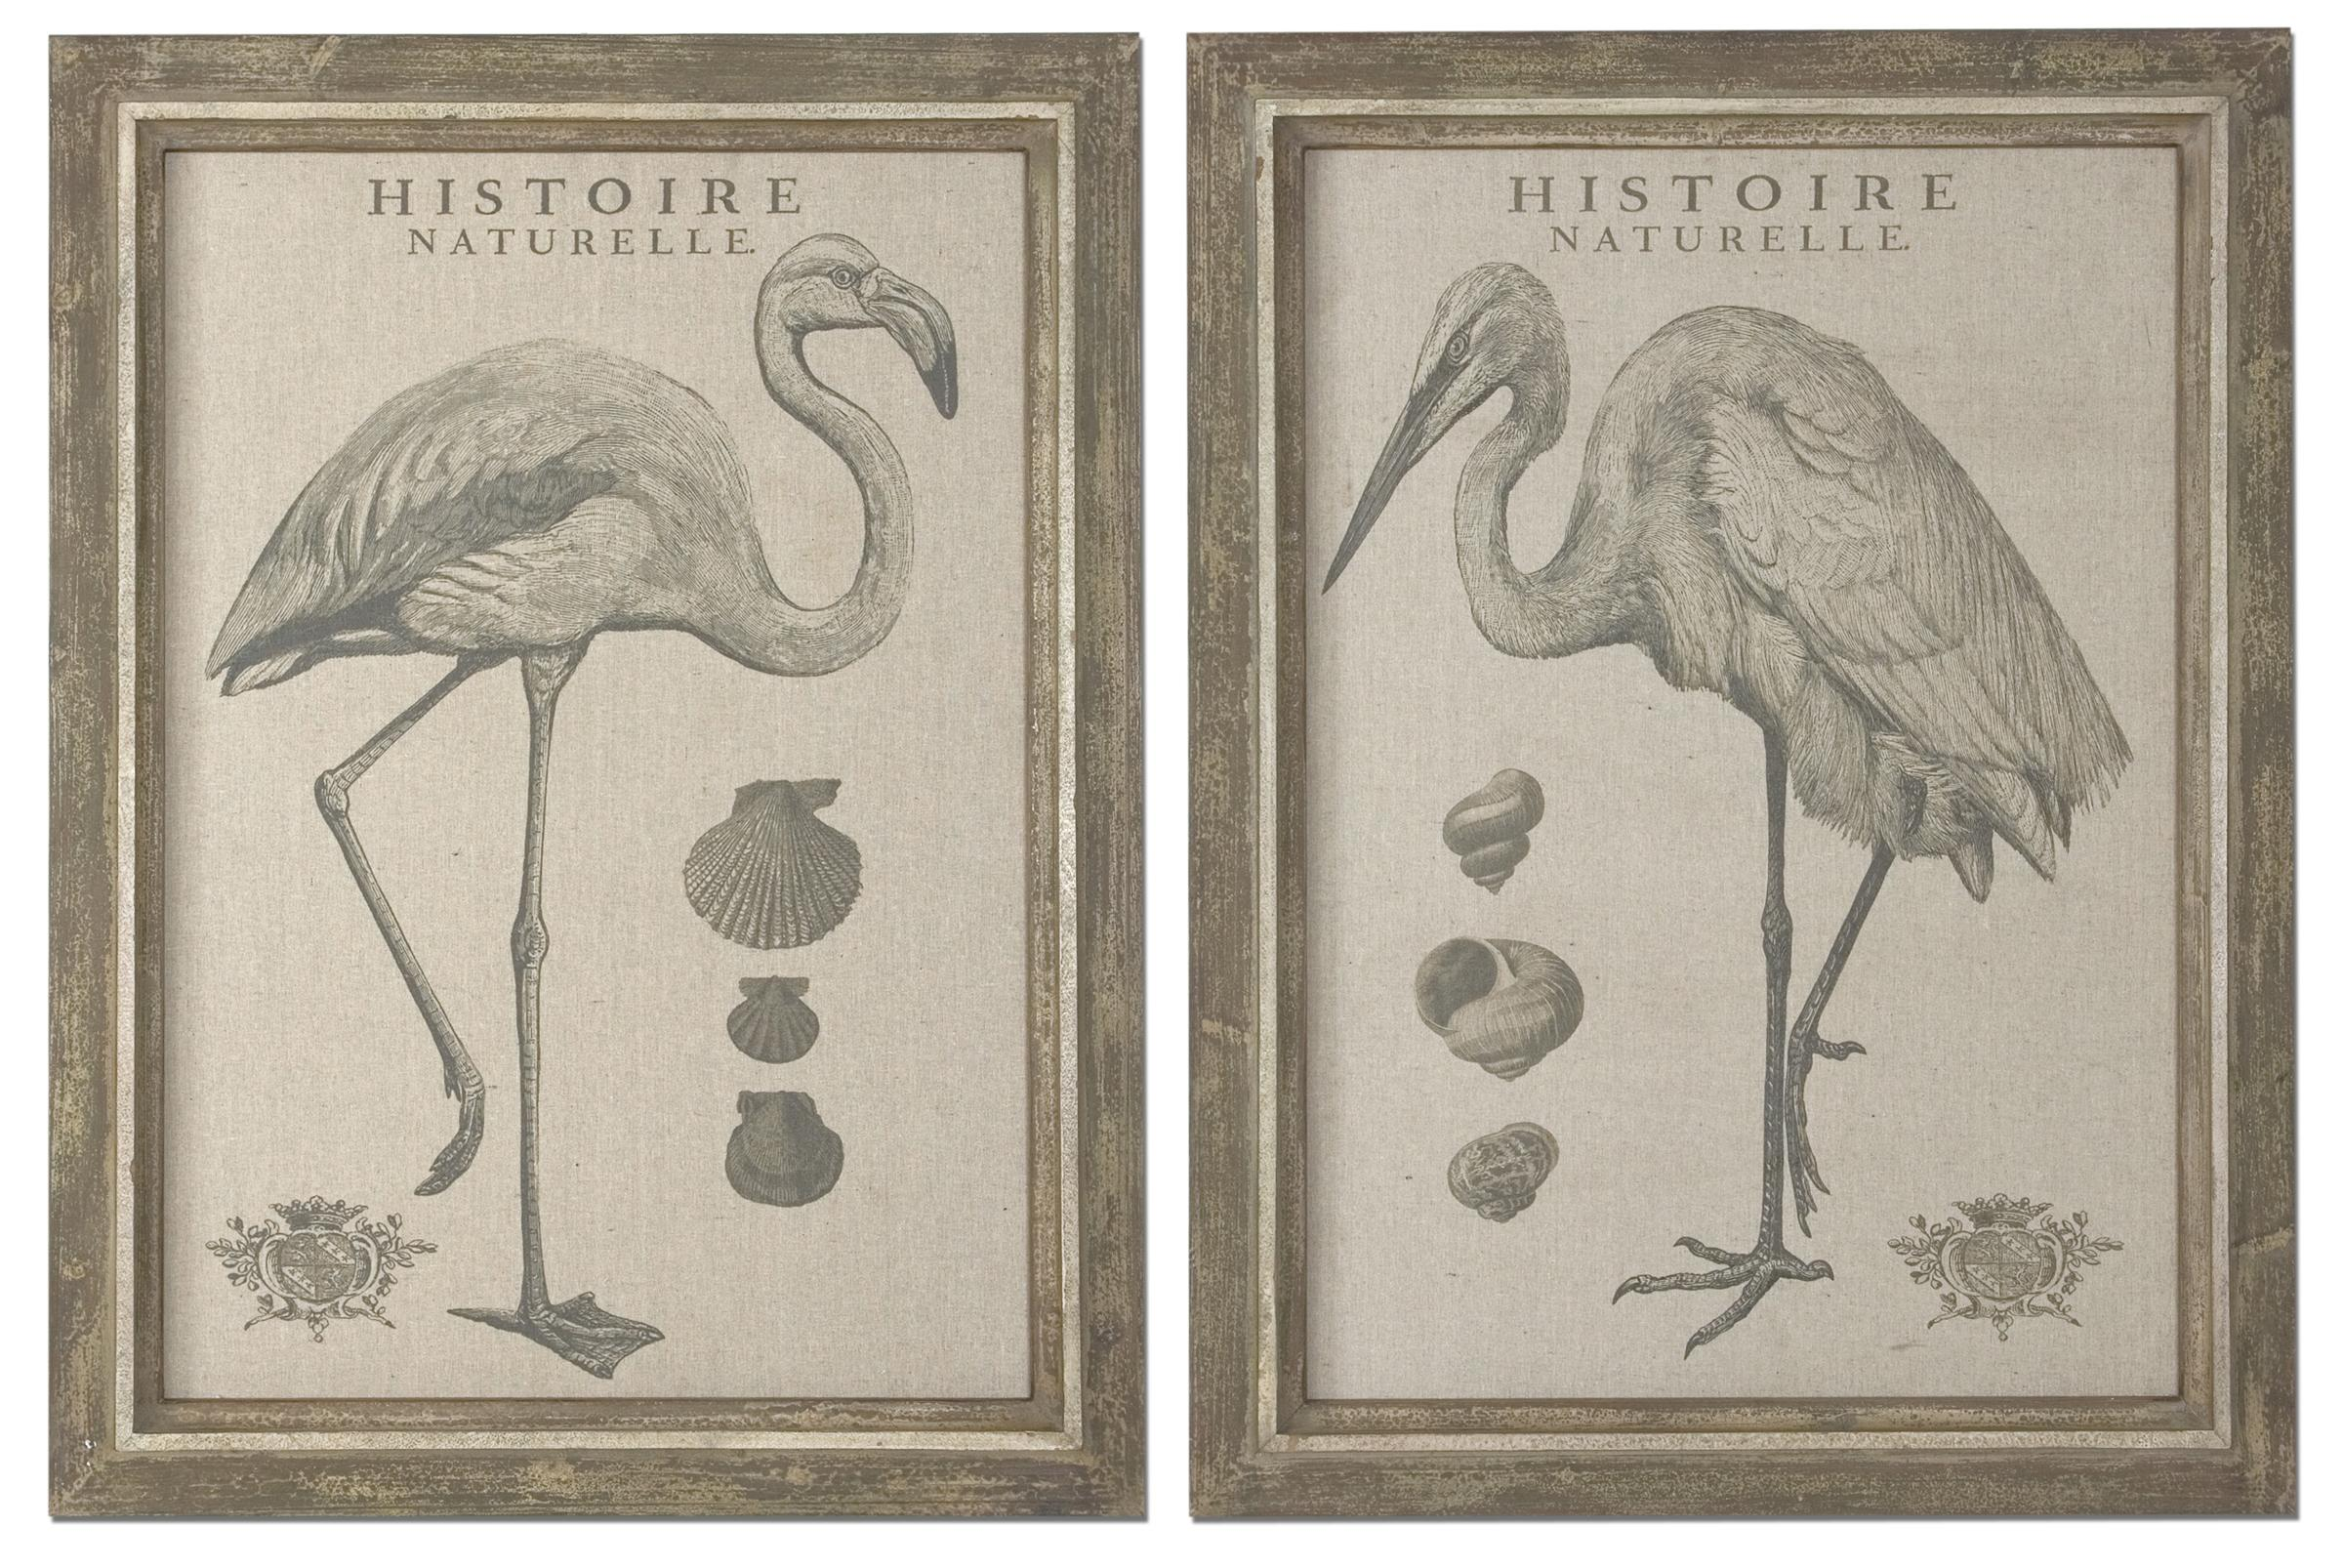 Uttermost Art Natural History - Item Number: 51077